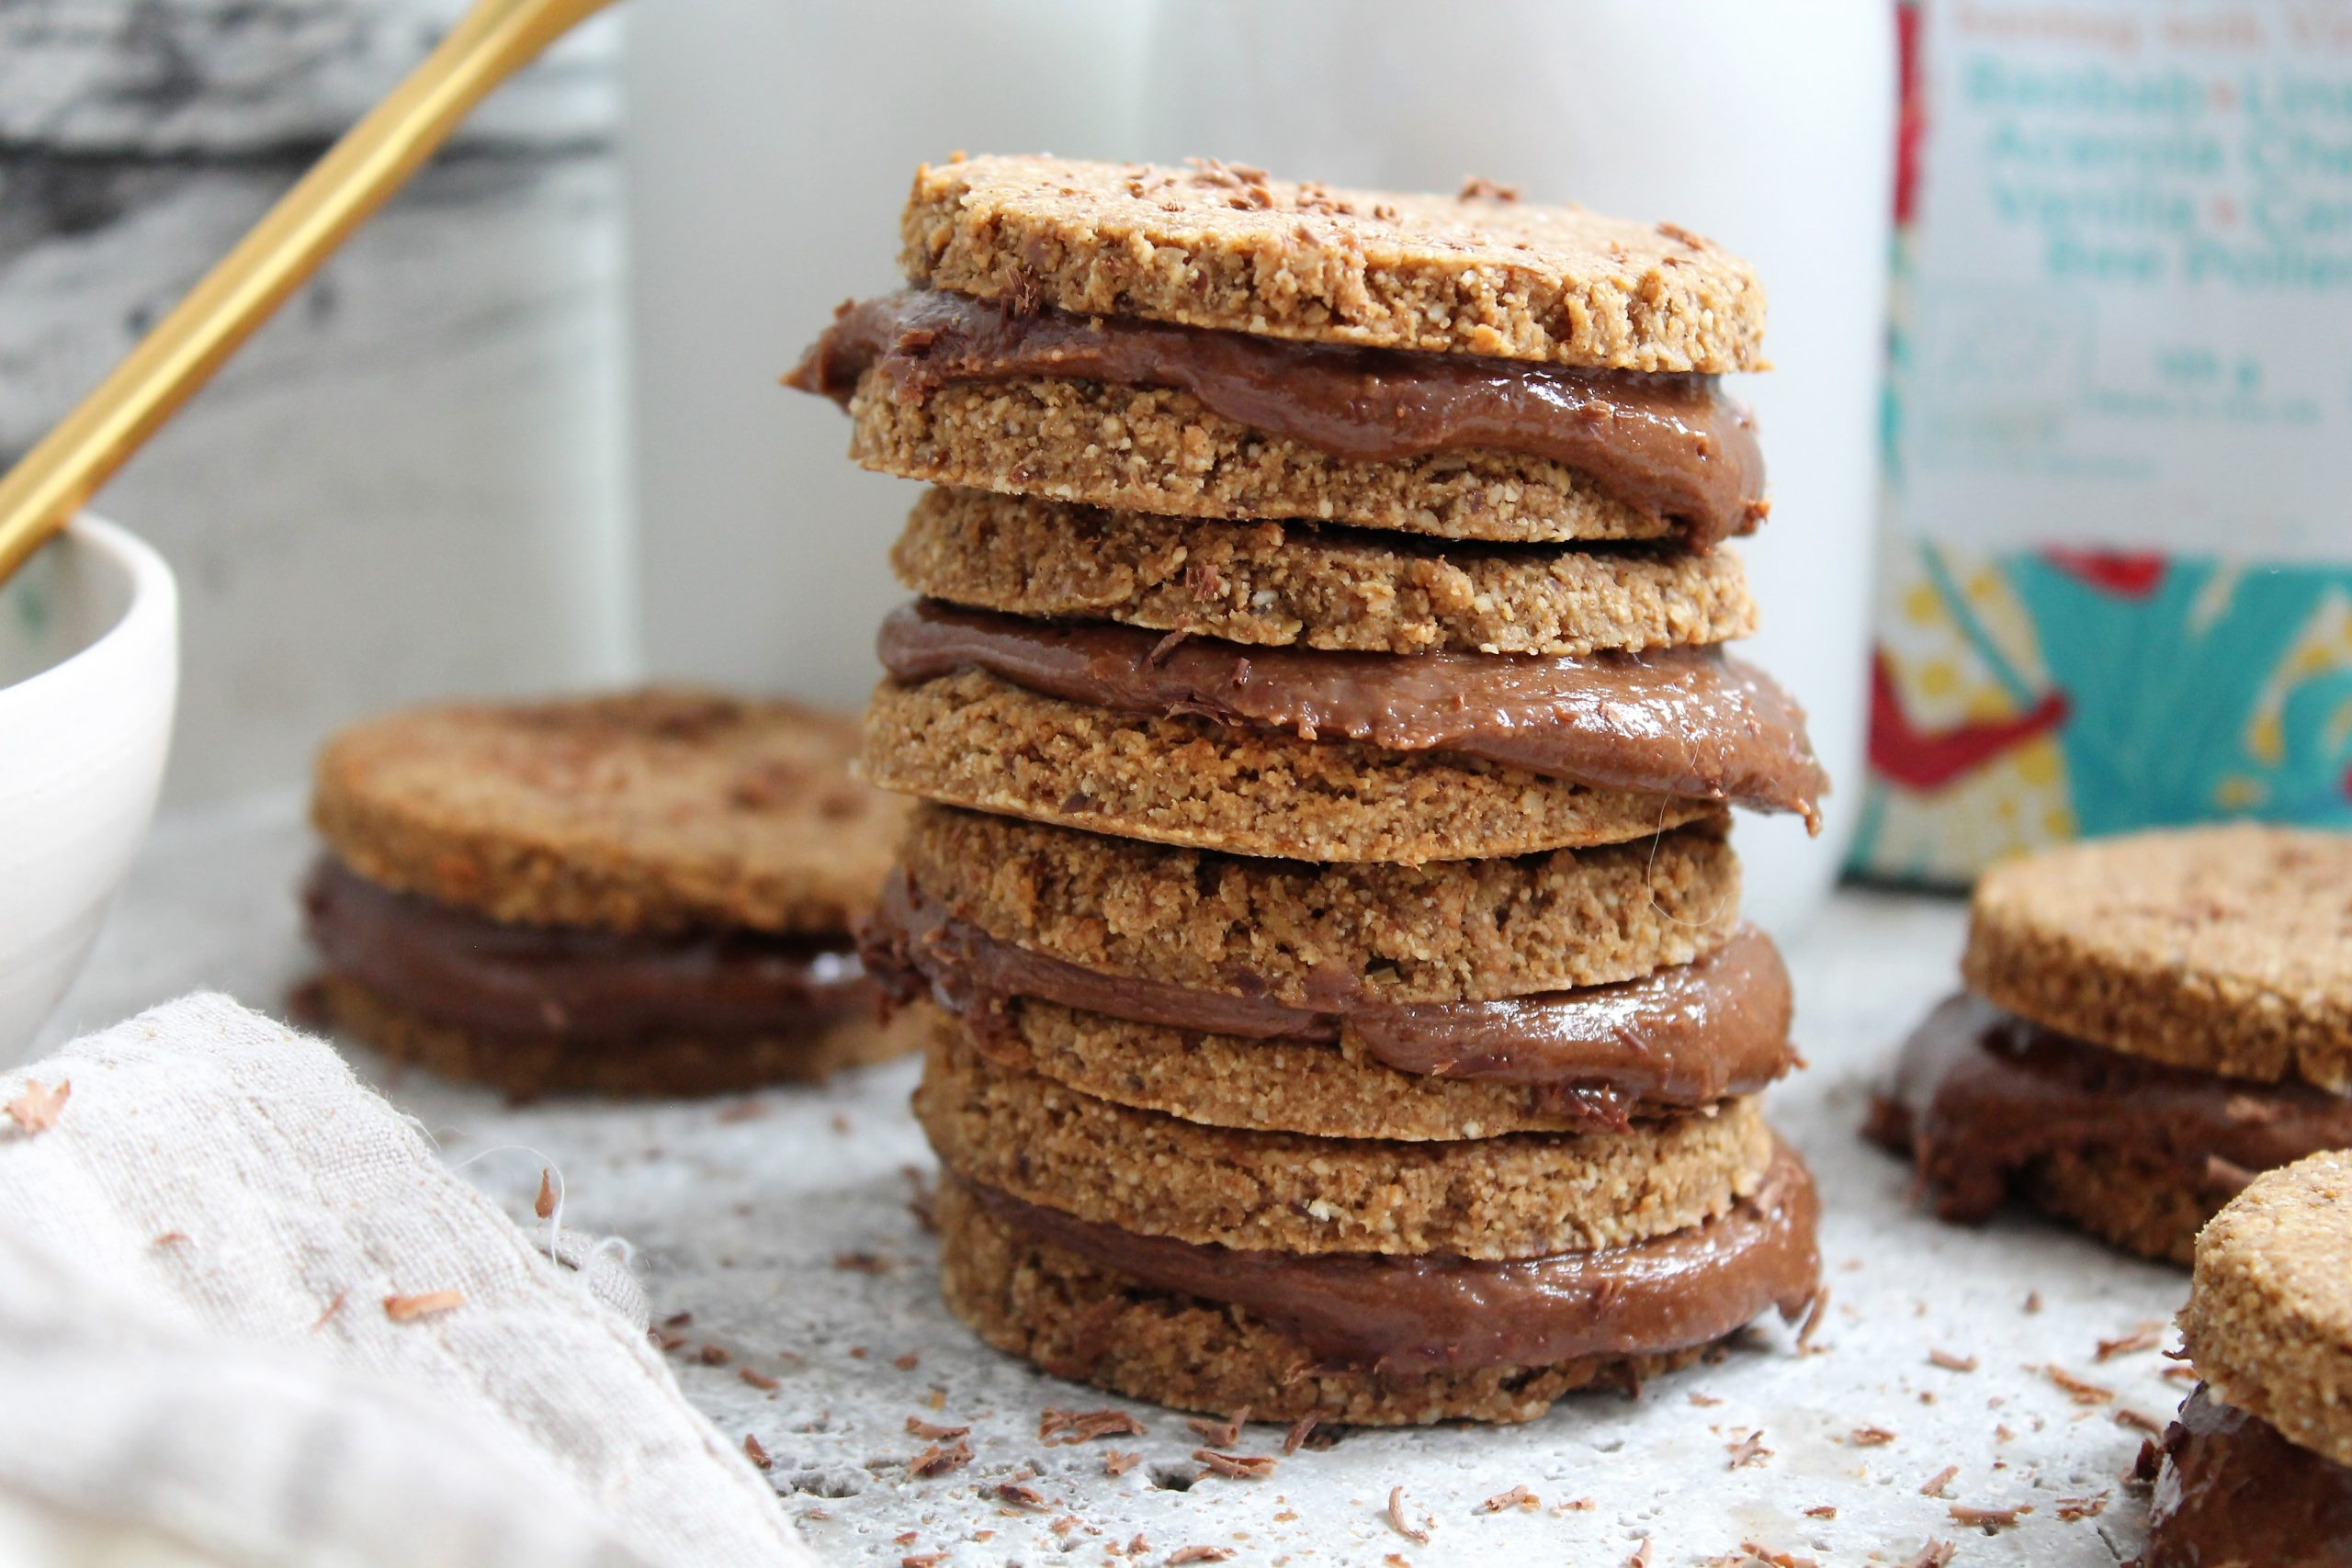 Vanilla & Chocolate Sandwich Cookies